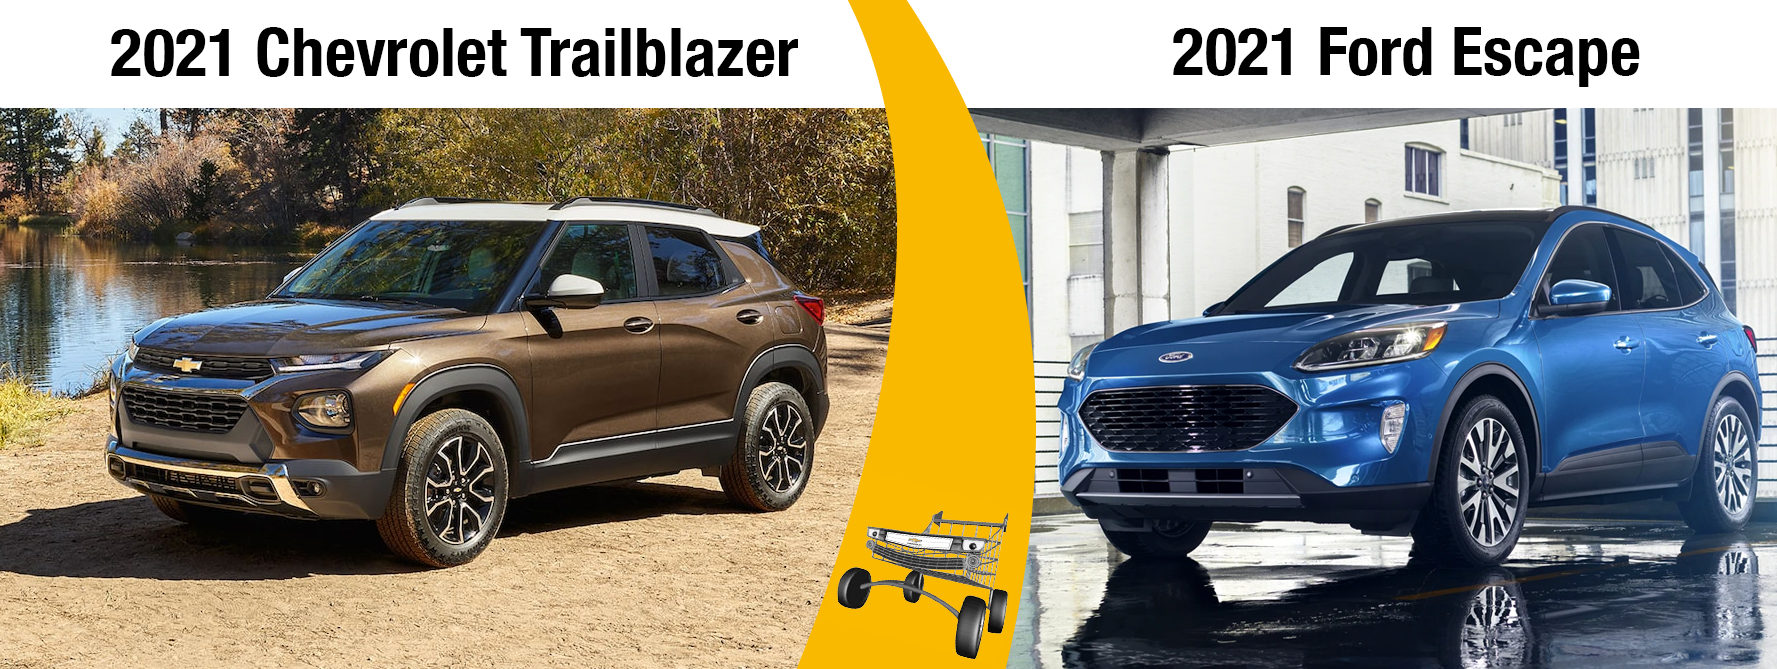 2021 Chevrolet Trailblazer Vs. 2021 Ford Escape